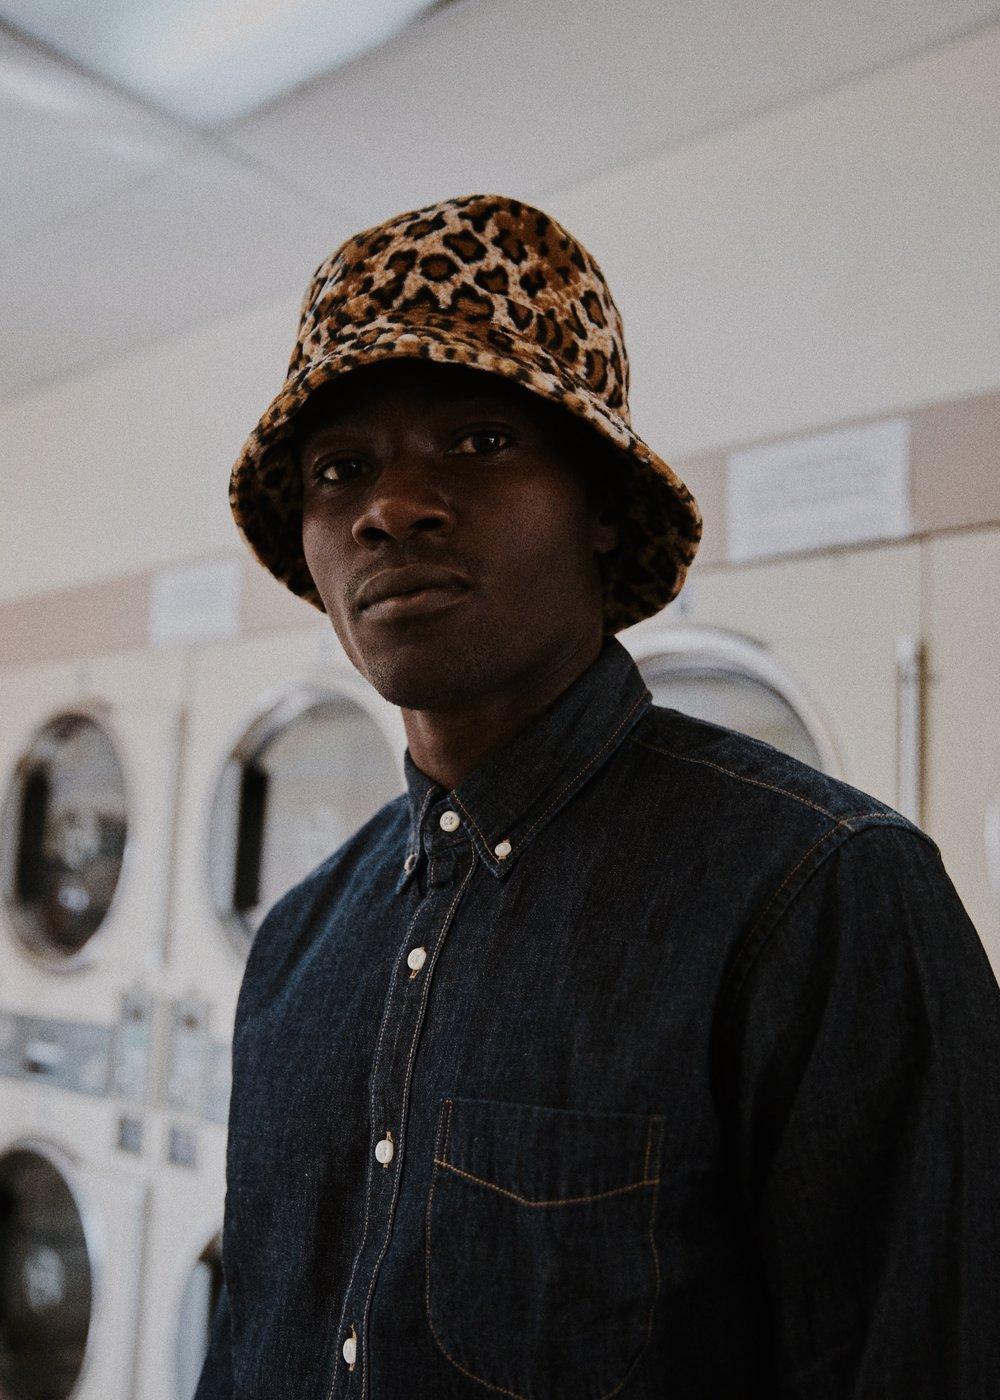 10_01_Laundromat-Arturo-Suzy-012_w.JPEG